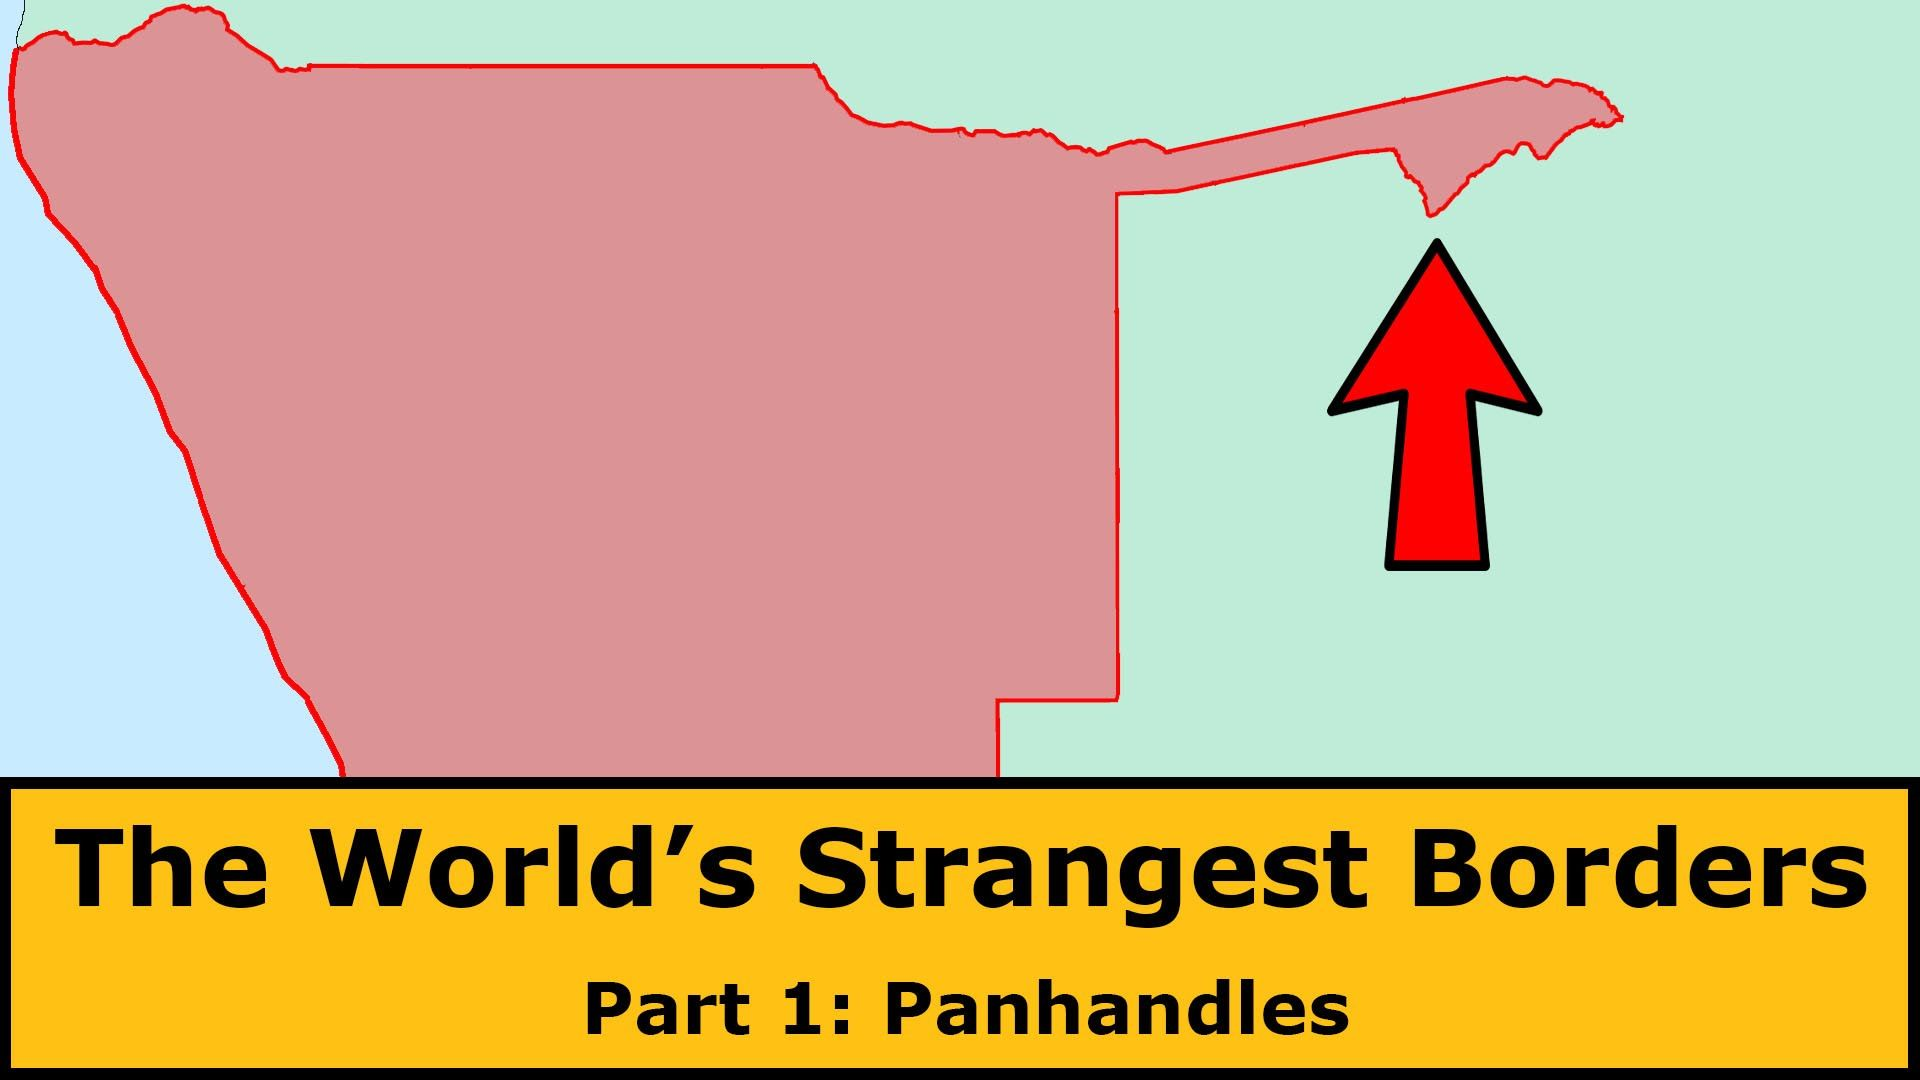 The World's Strangest Borders Part 1: Panhandles